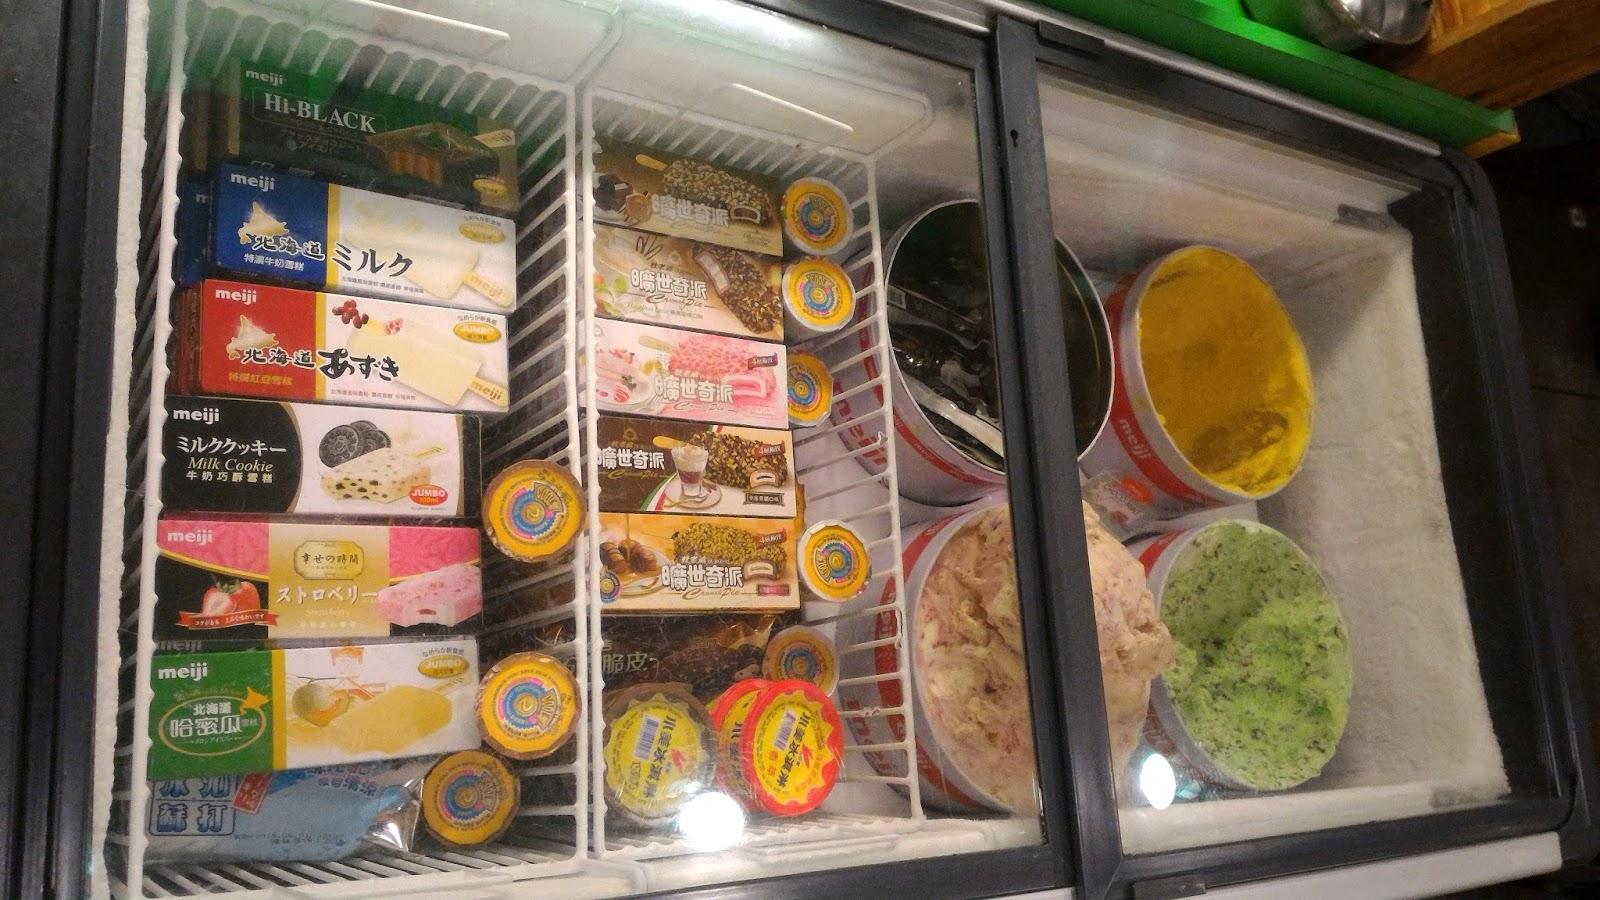 P 20160725 181423 - [食記] 廣香吃到飽日式涮涮鍋,超多種飲料、冰品及甜點!